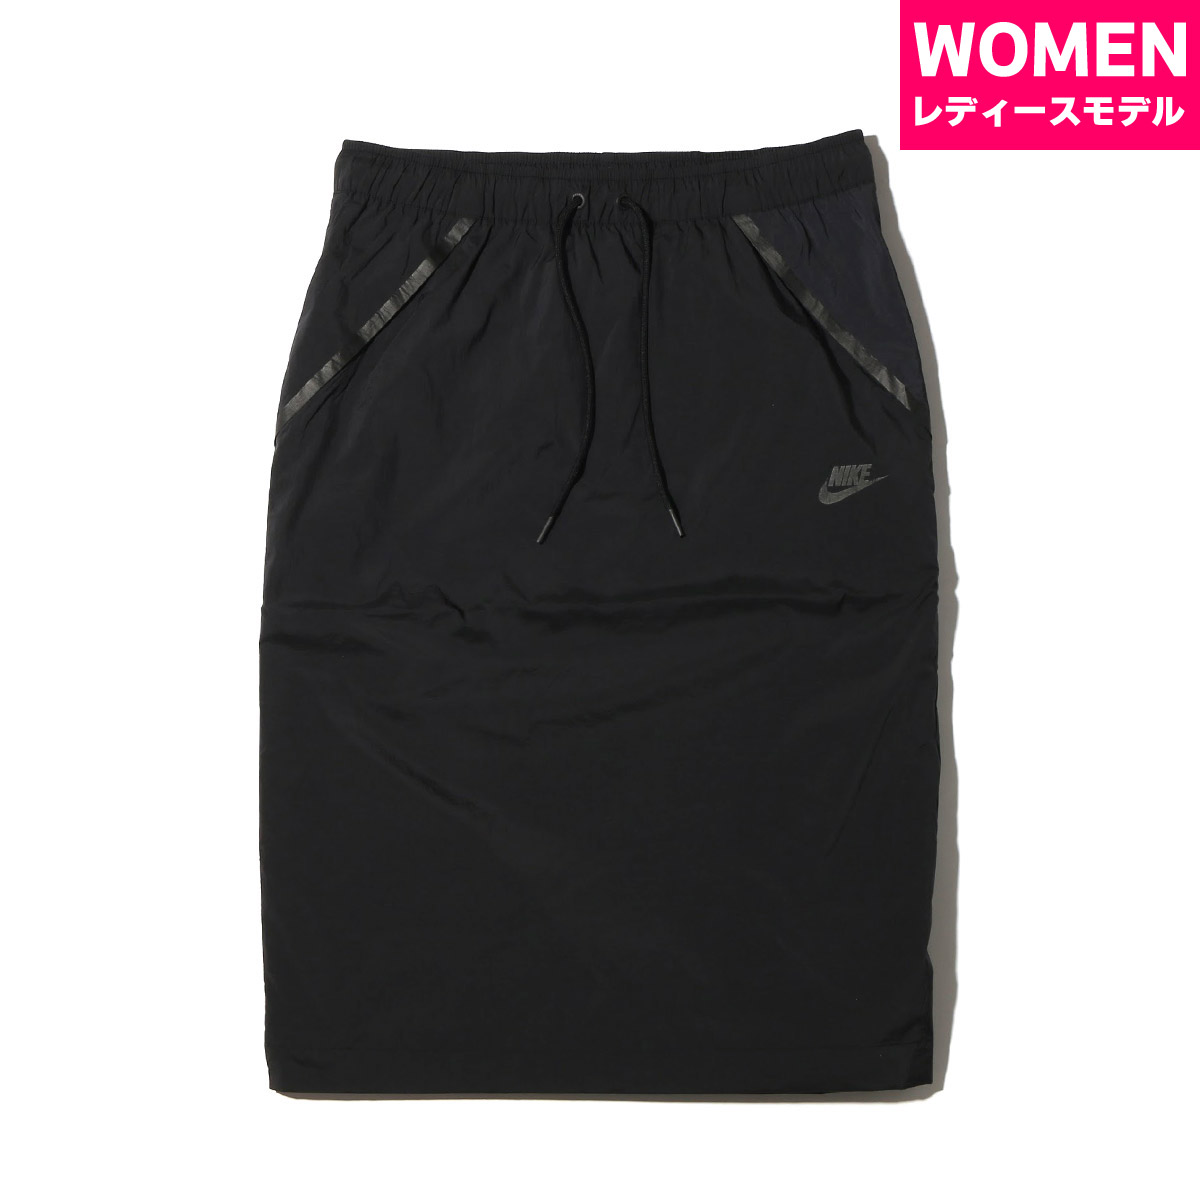 NIKE AS W NSW TCH HPRMSH SKIRT (나이키 womens 텍 하이퍼 메쉬 스커트) (BLACK/BLACK) 17 SU-S